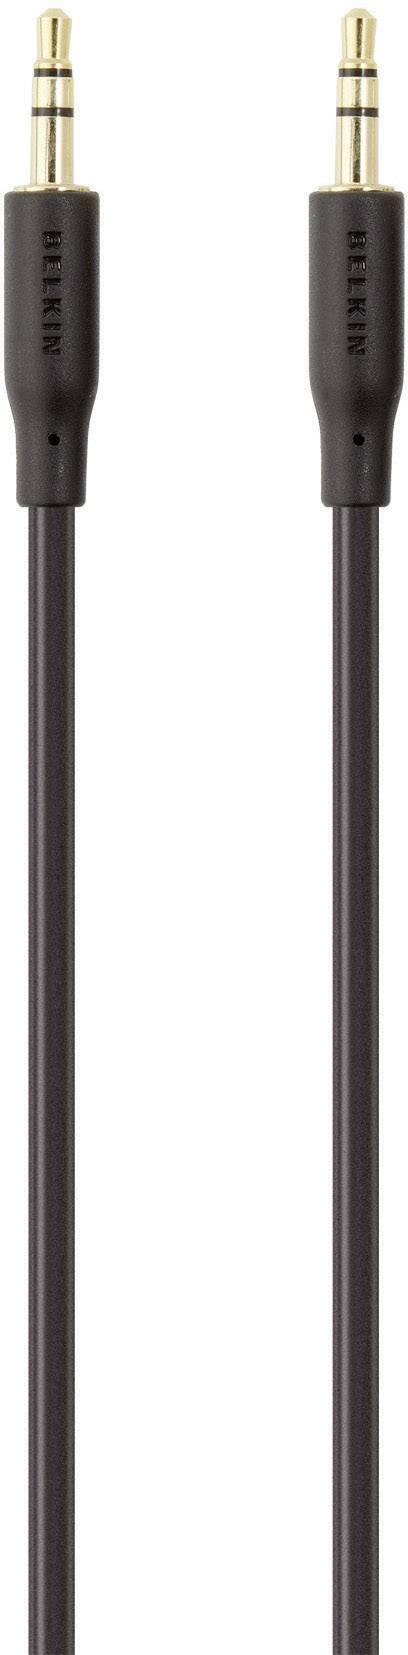 Jack audio prepojovací kábel Belkin F3Y117bt2M, 2 m, čierna